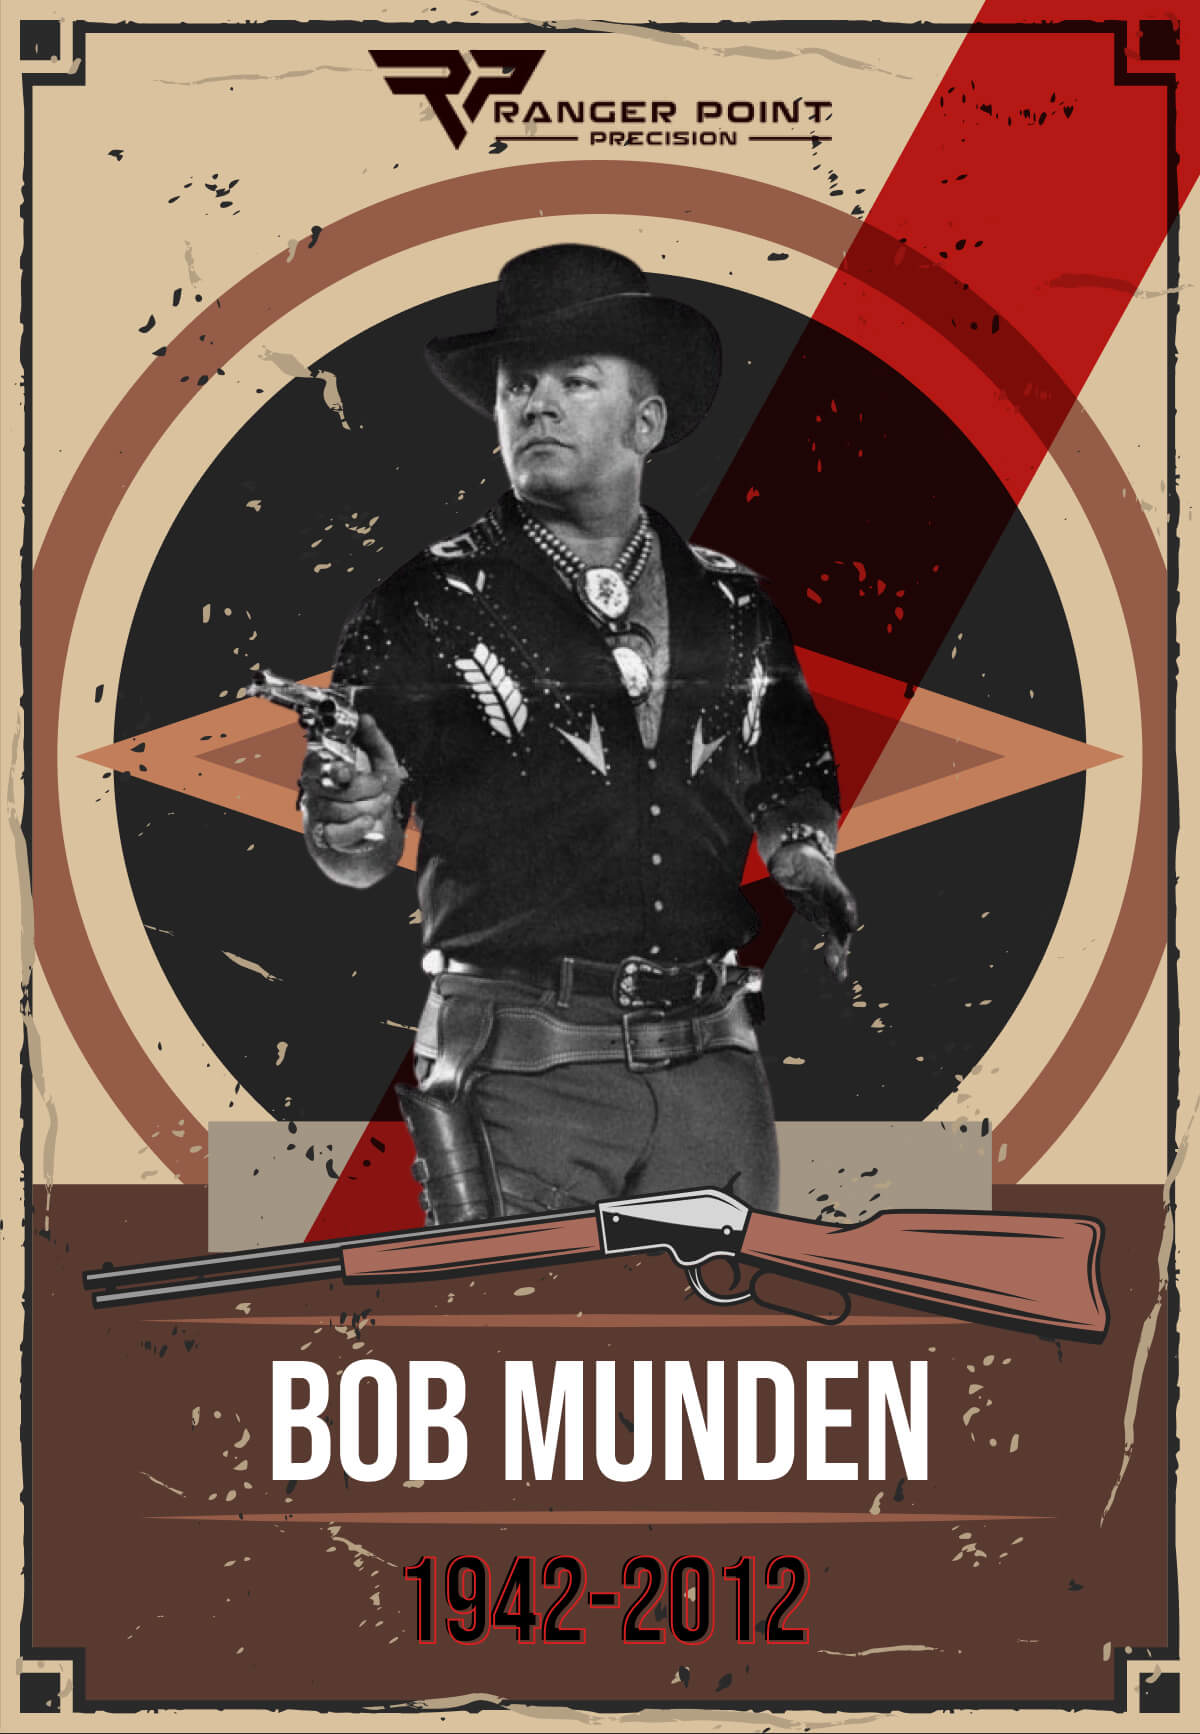 Bob Munden's Life At a Glance